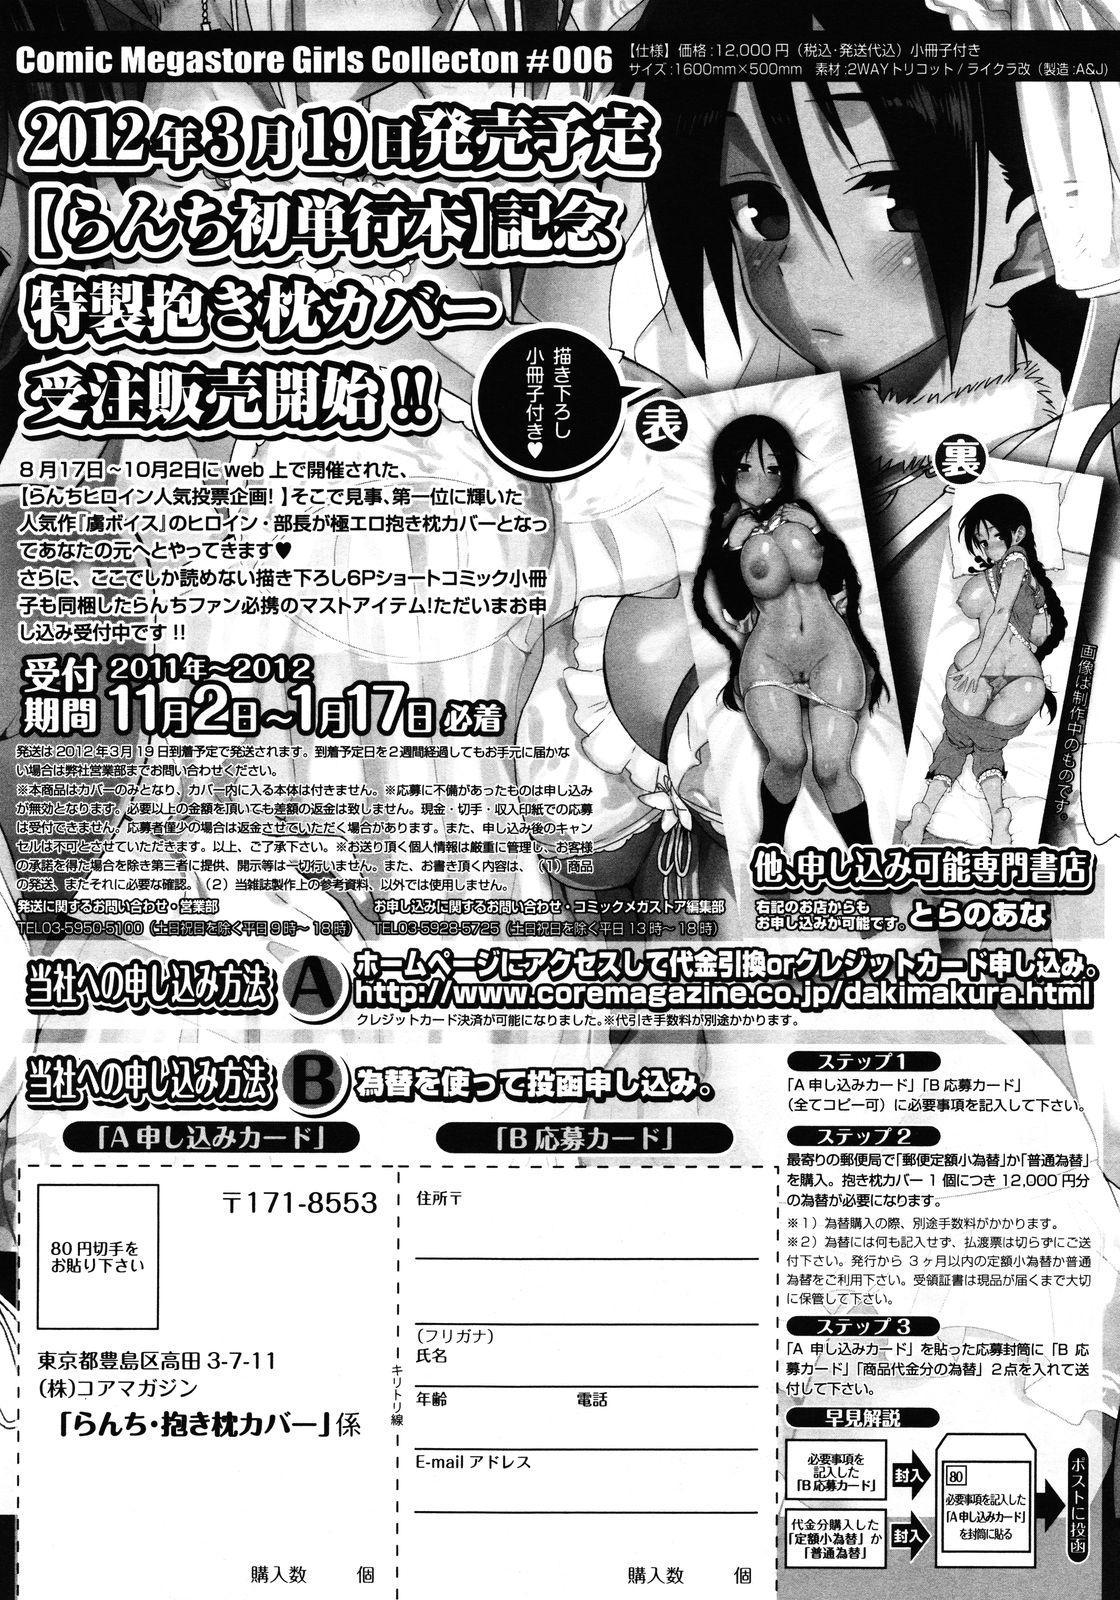 COMIC Megastore 2012-01 294